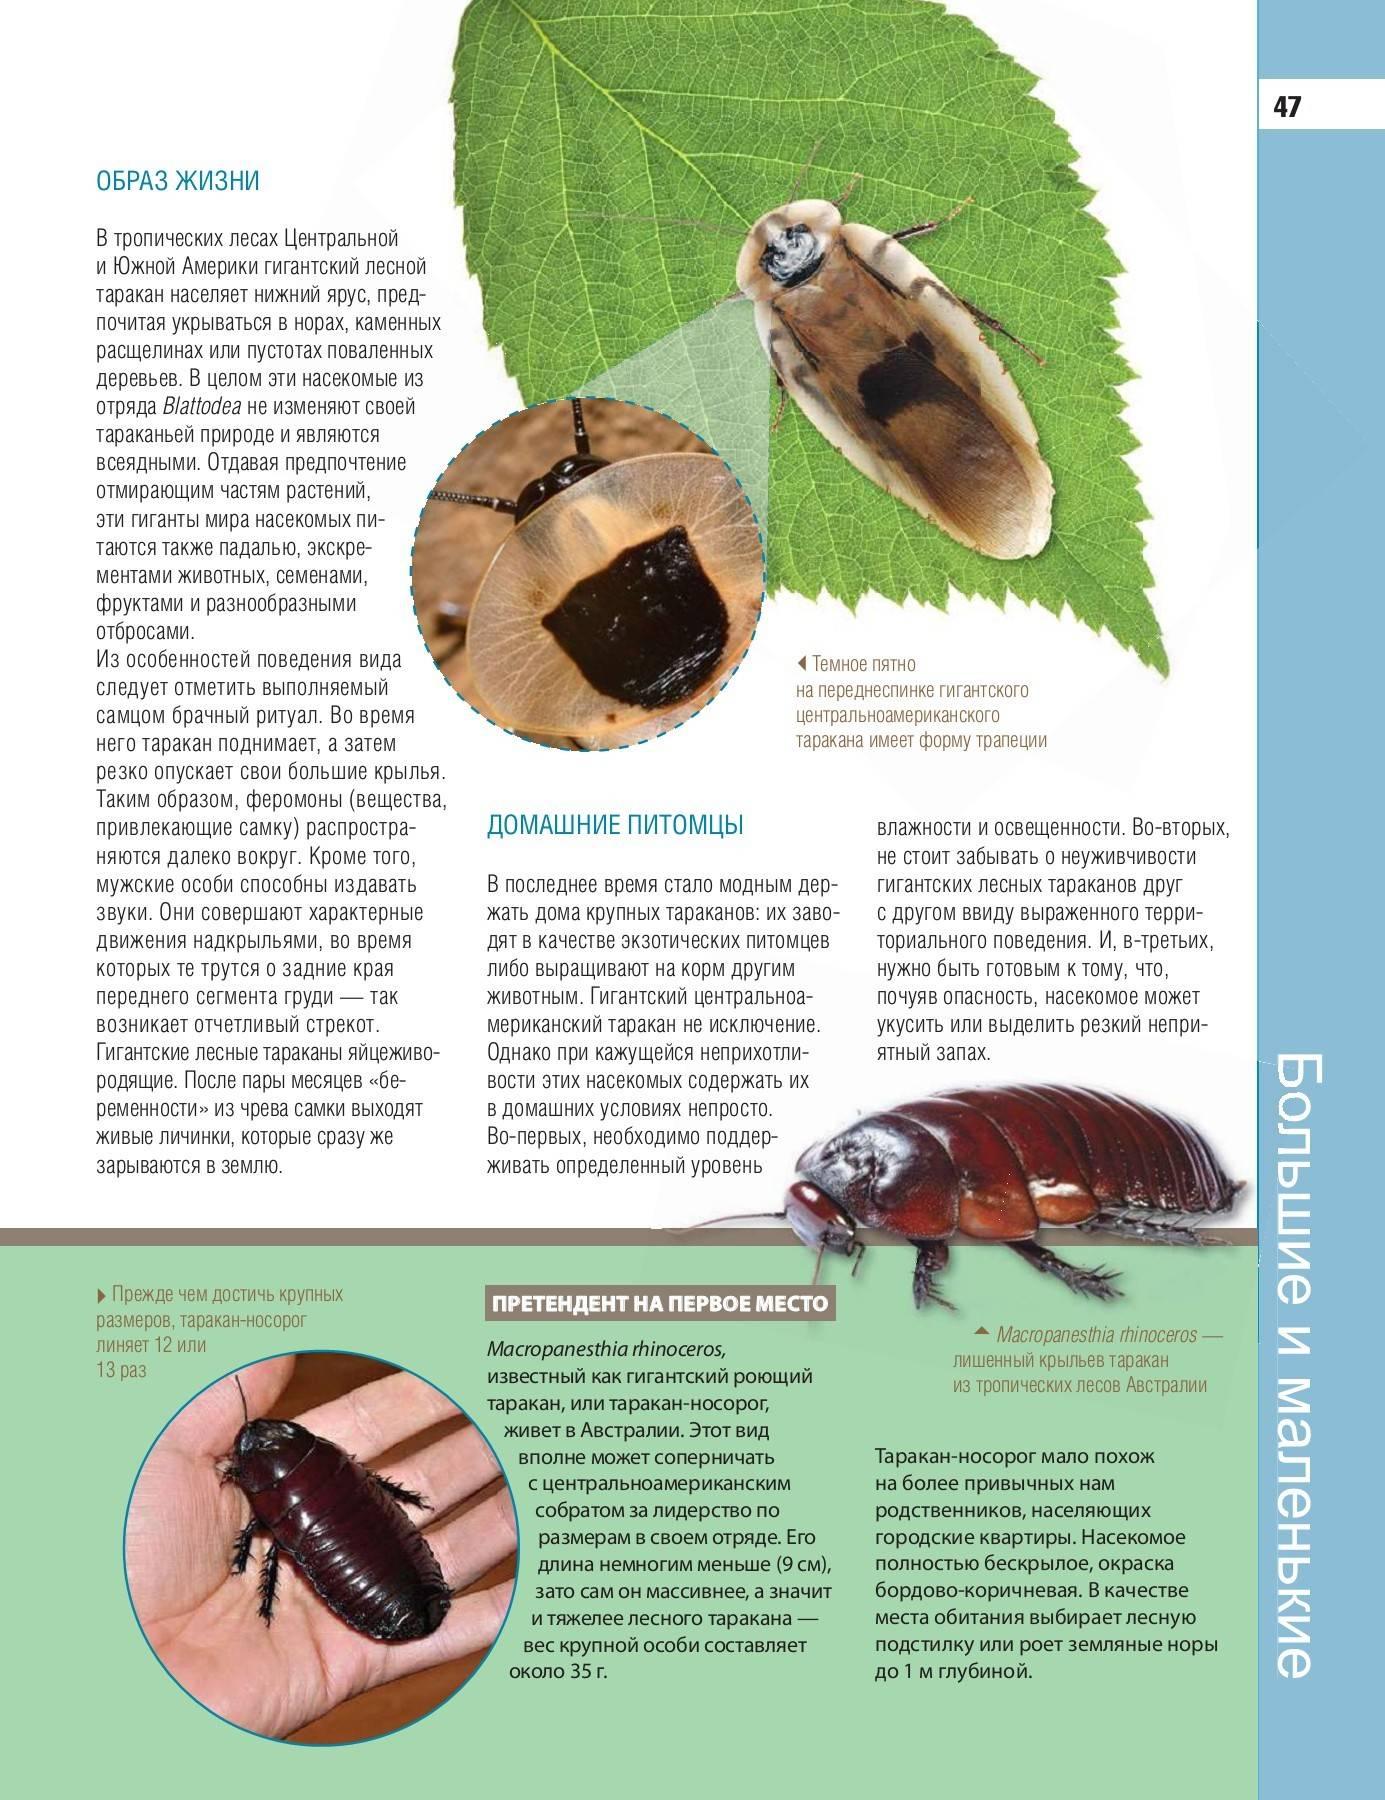 Личинки тараканов: фото и описание